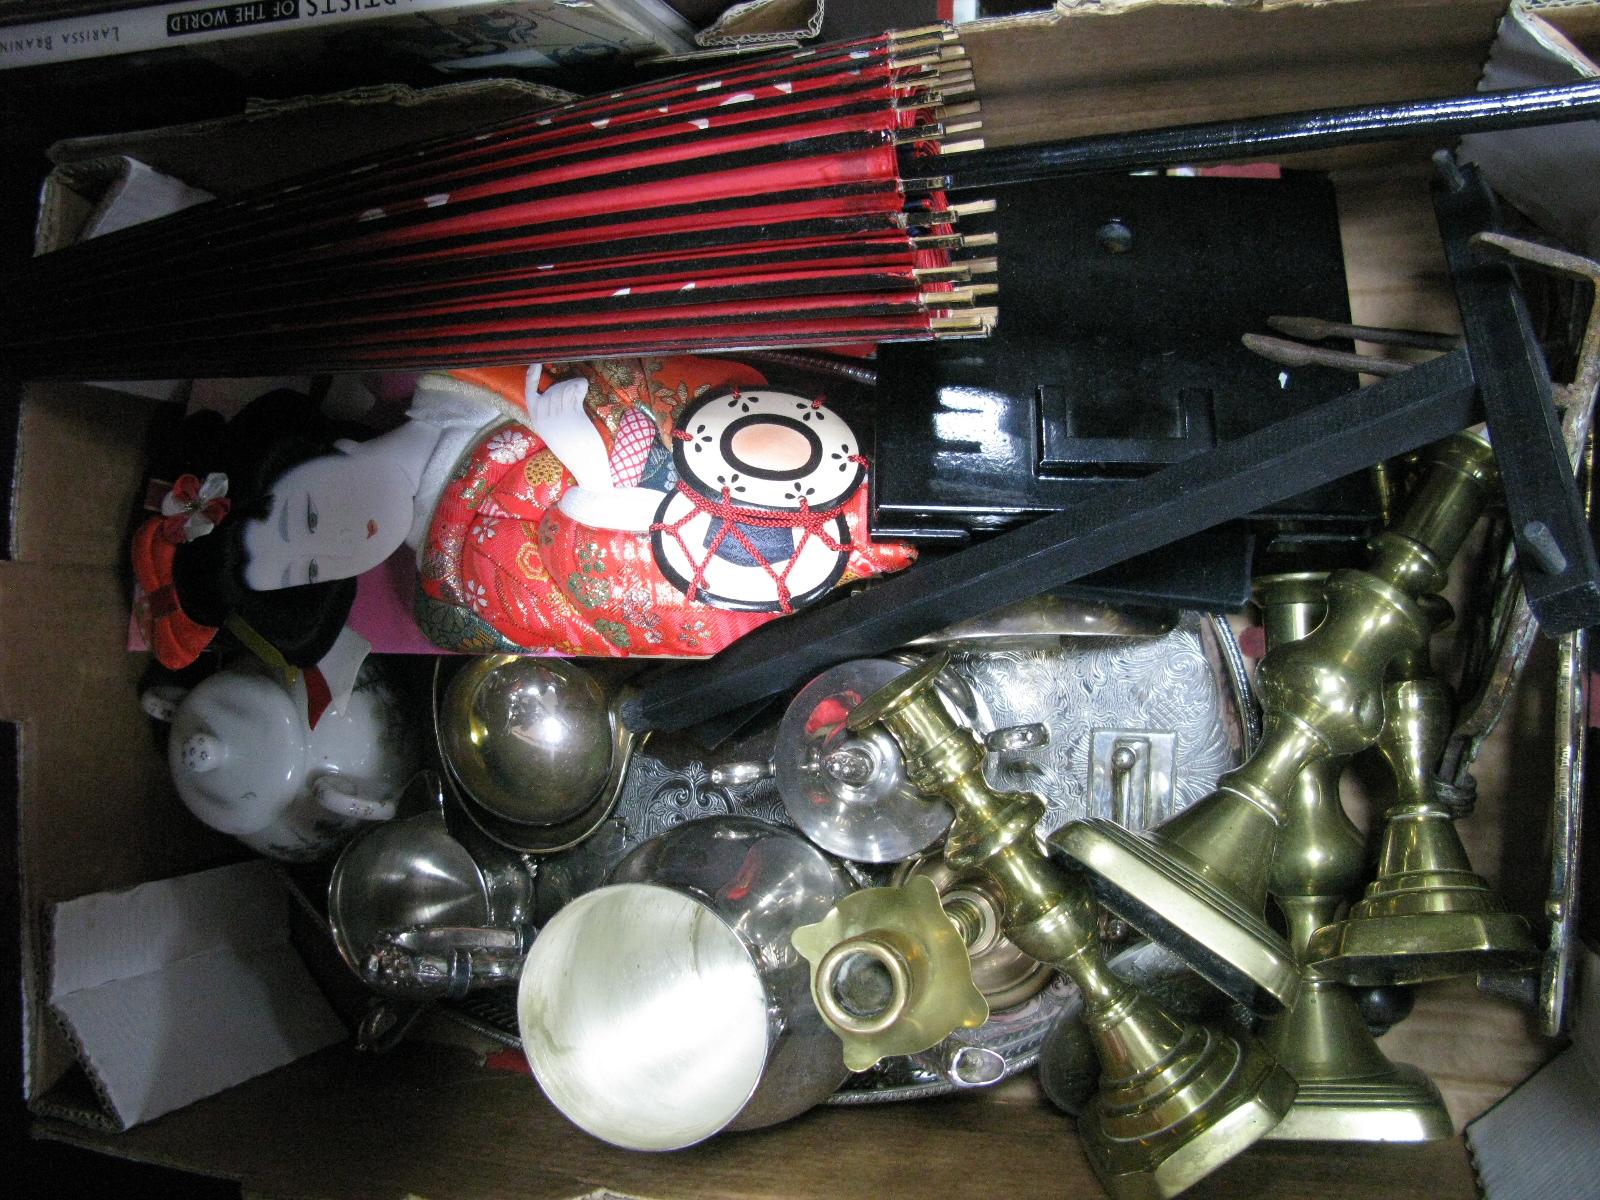 Lot 1027 - XIX Century Brass Trivets, XIX Century brass candlesticks, plated ware, plated handle, parasol and